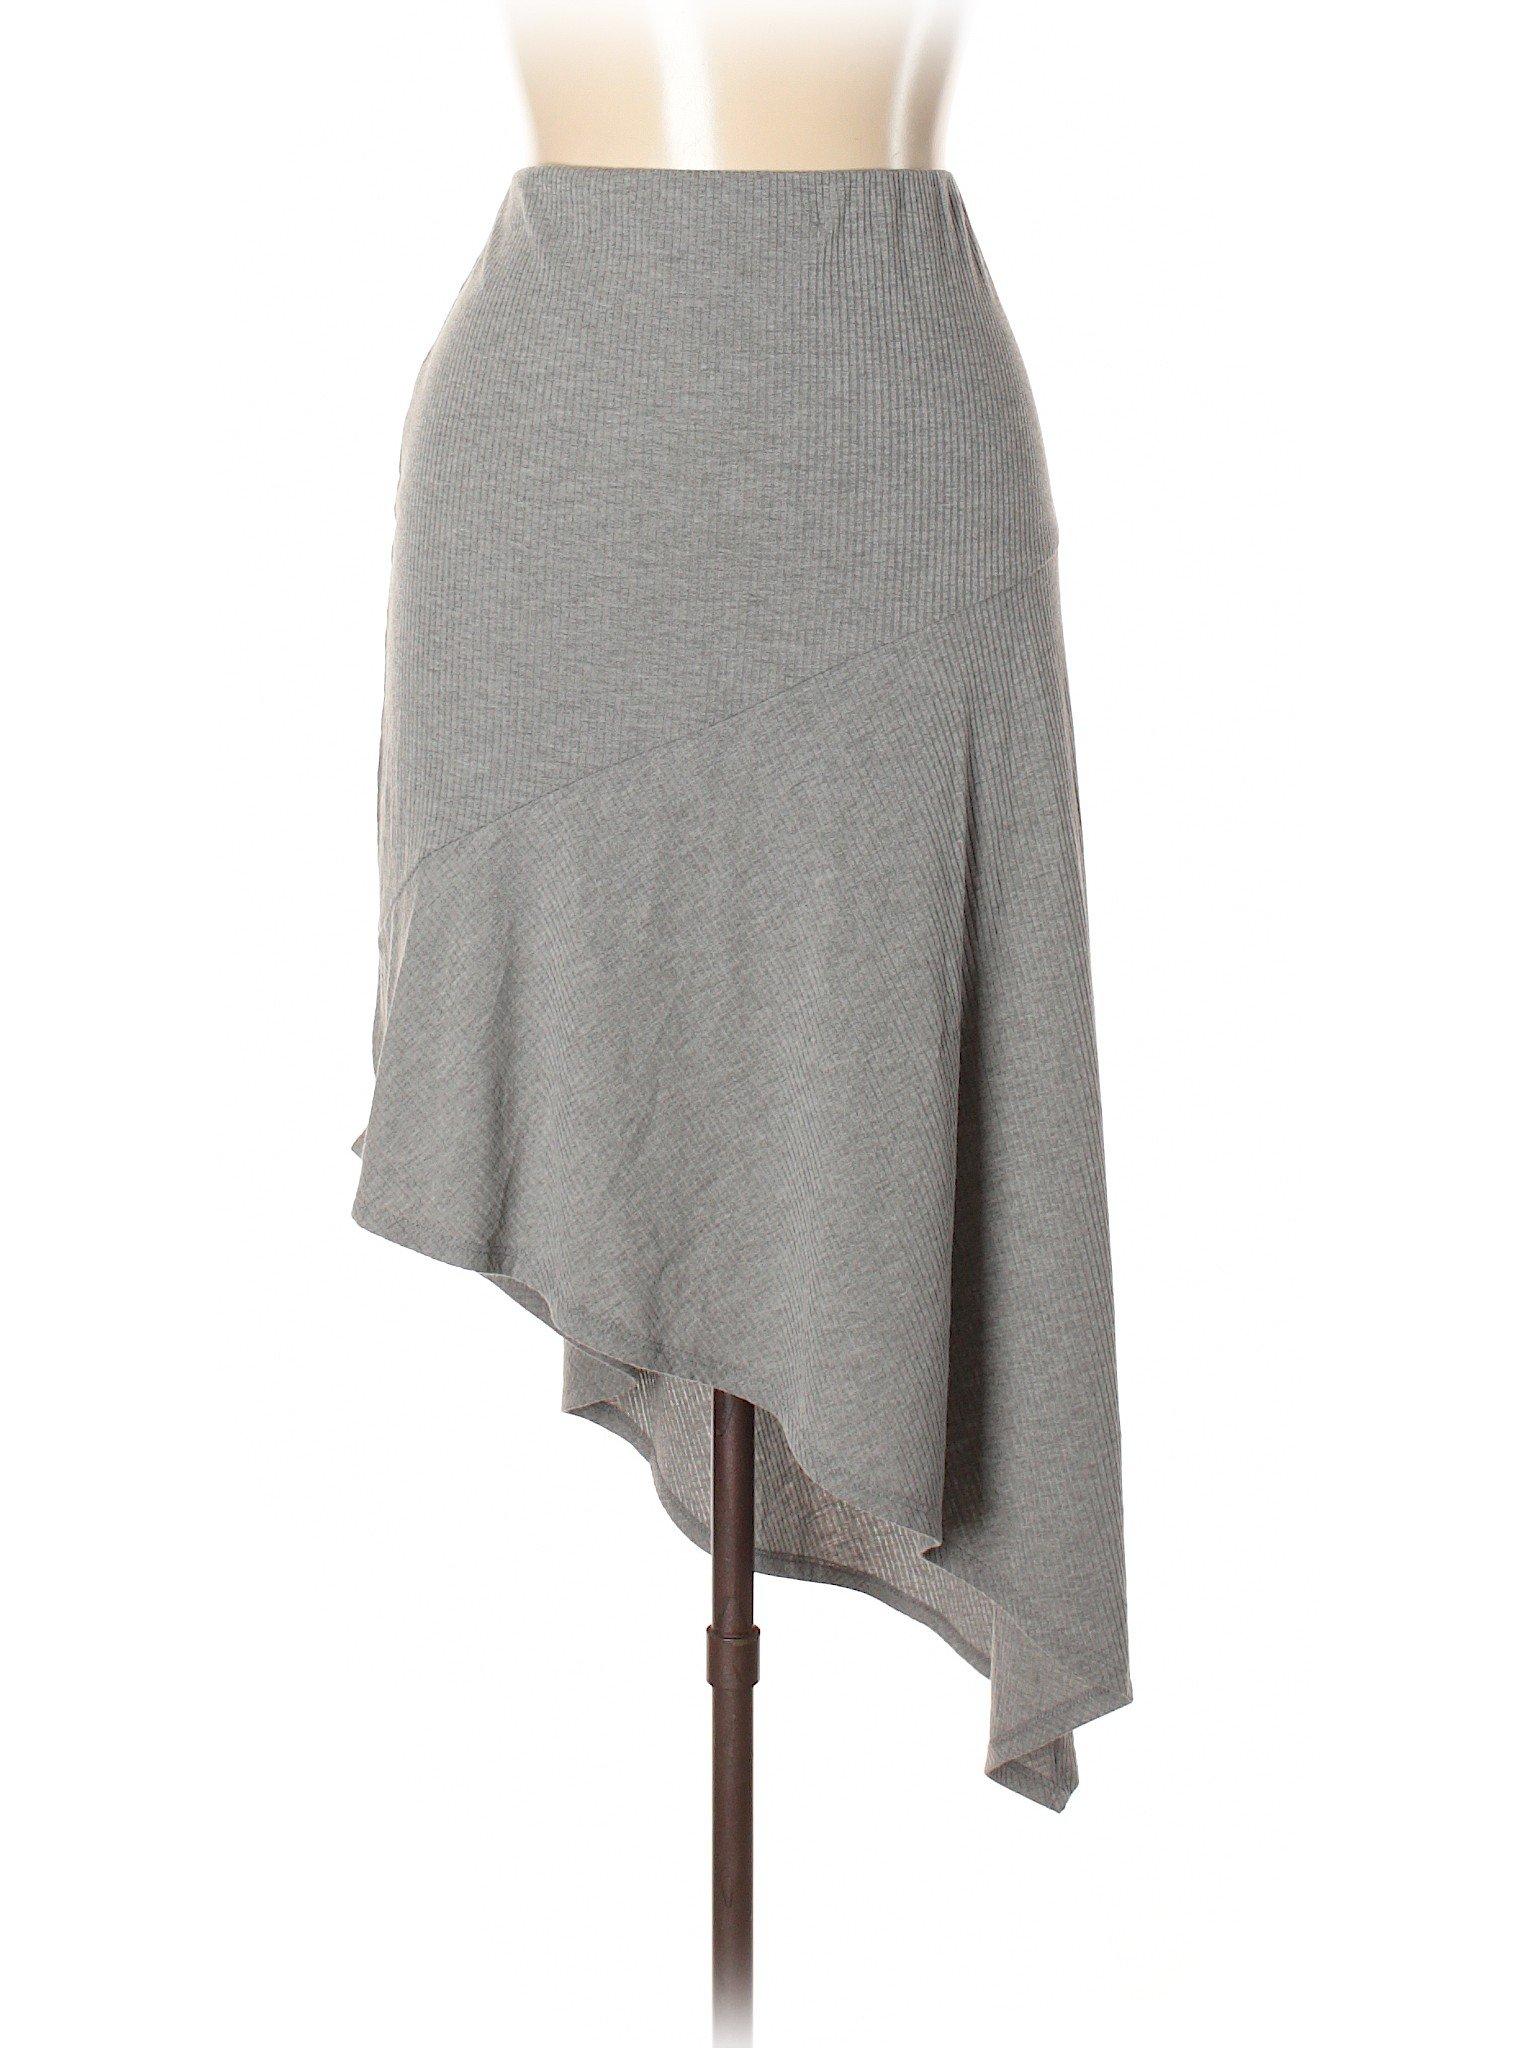 Casual Skirt Skirt Casual Boutique Boutique Skirt Casual Casual Boutique Skirt Boutique Boutique xPZavqwp